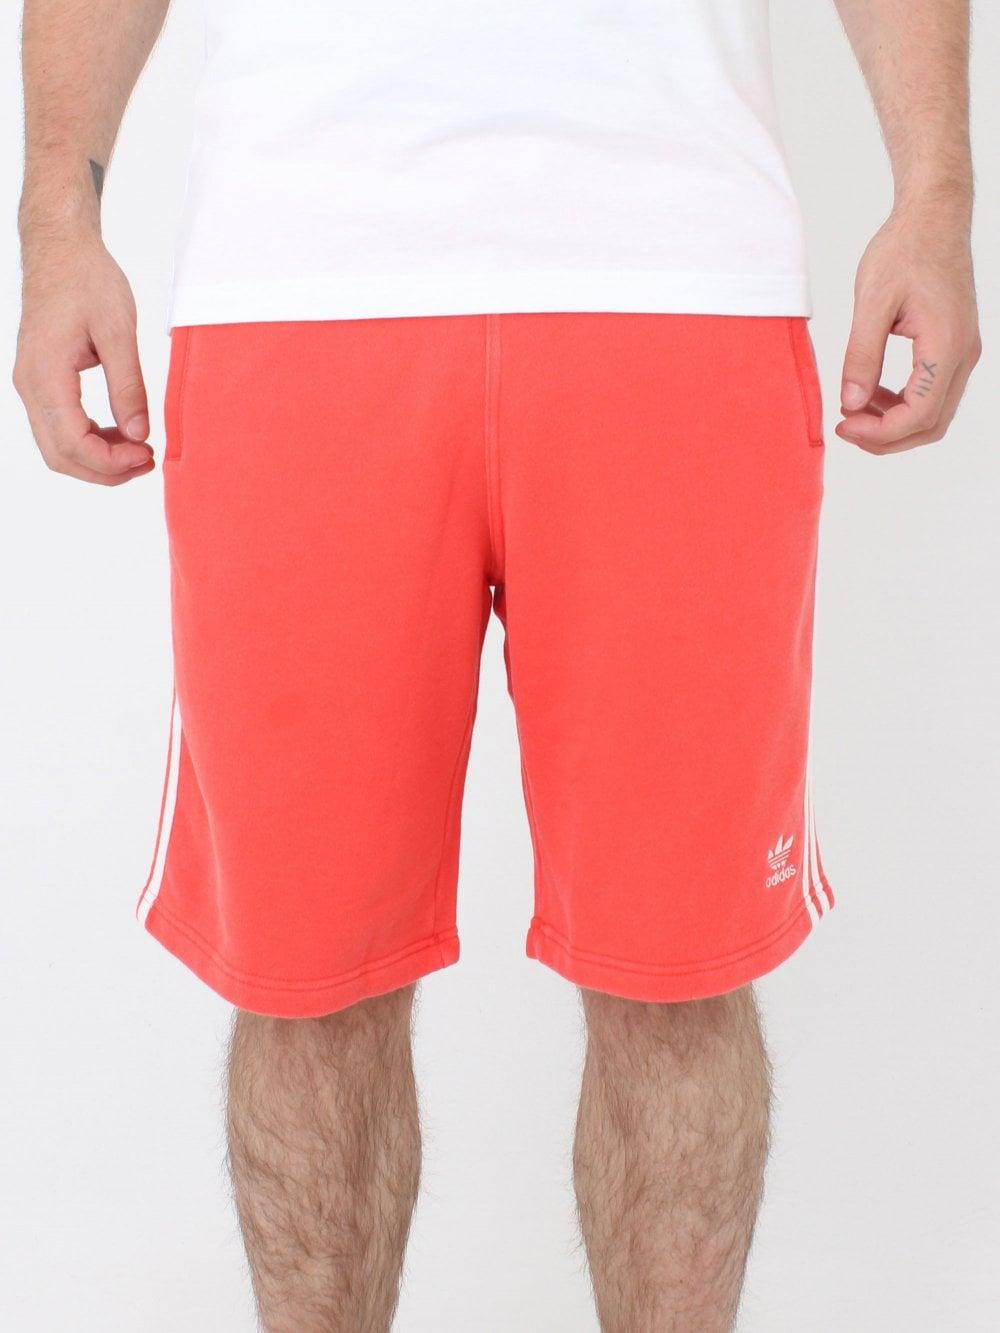 efc1ac42d1 Adidas 3 Stripe Shorts in Bright Red | Northern Threads